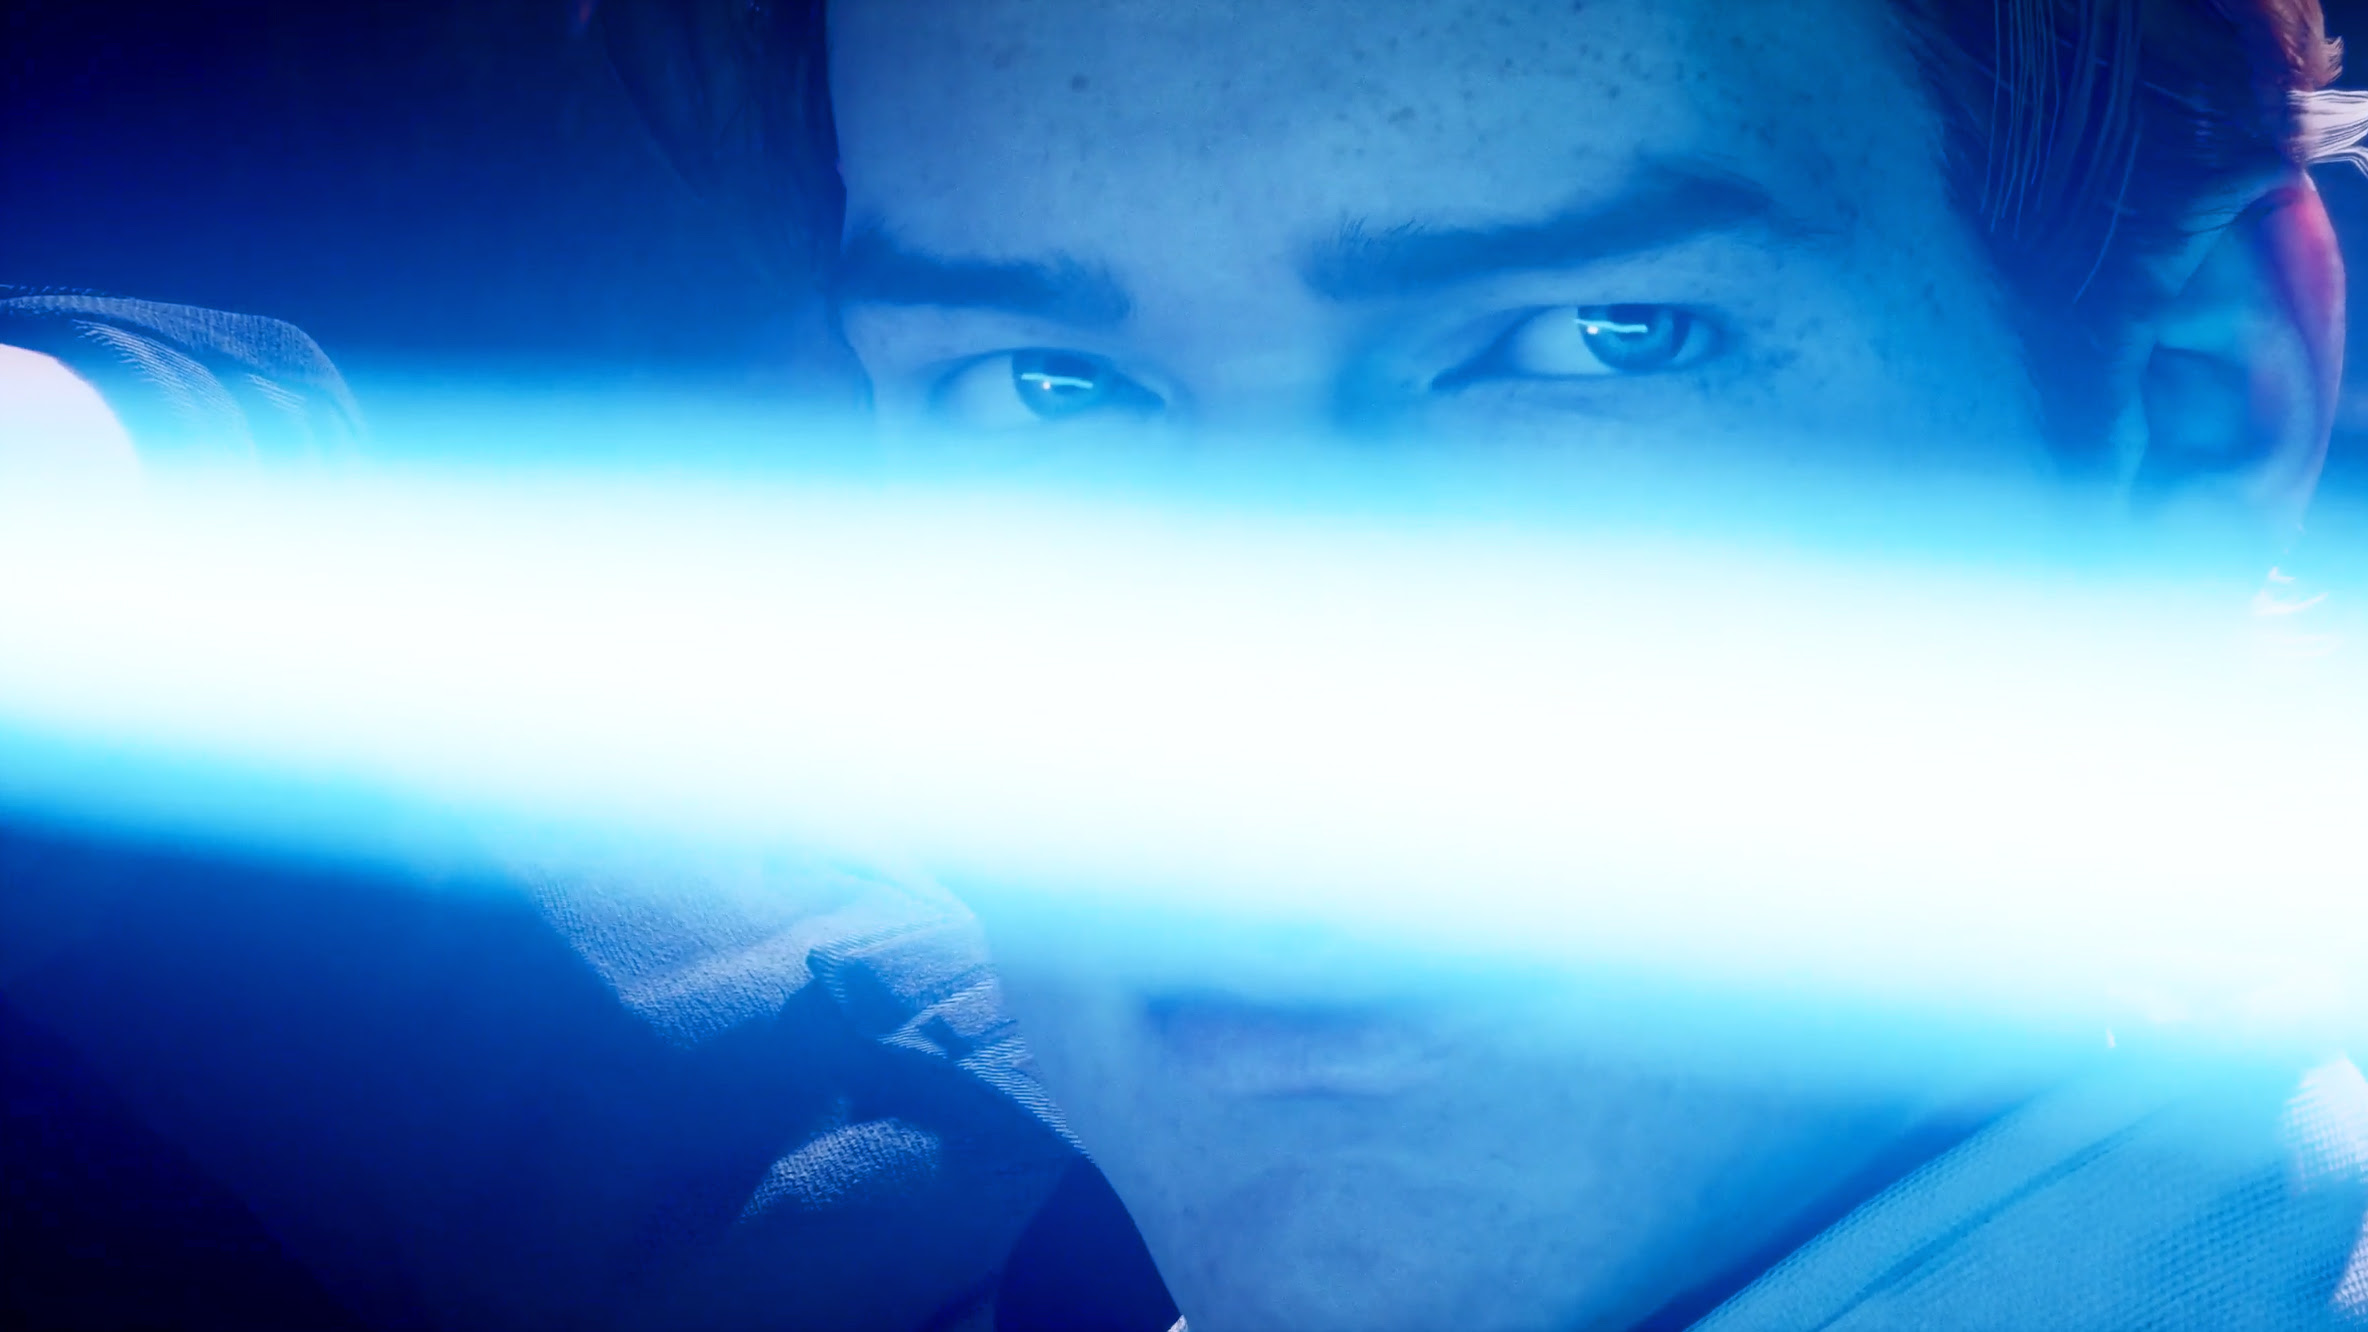 Star Wars Jedi Fallen Order Gameplay Release Date Trailers And News Infoniworld